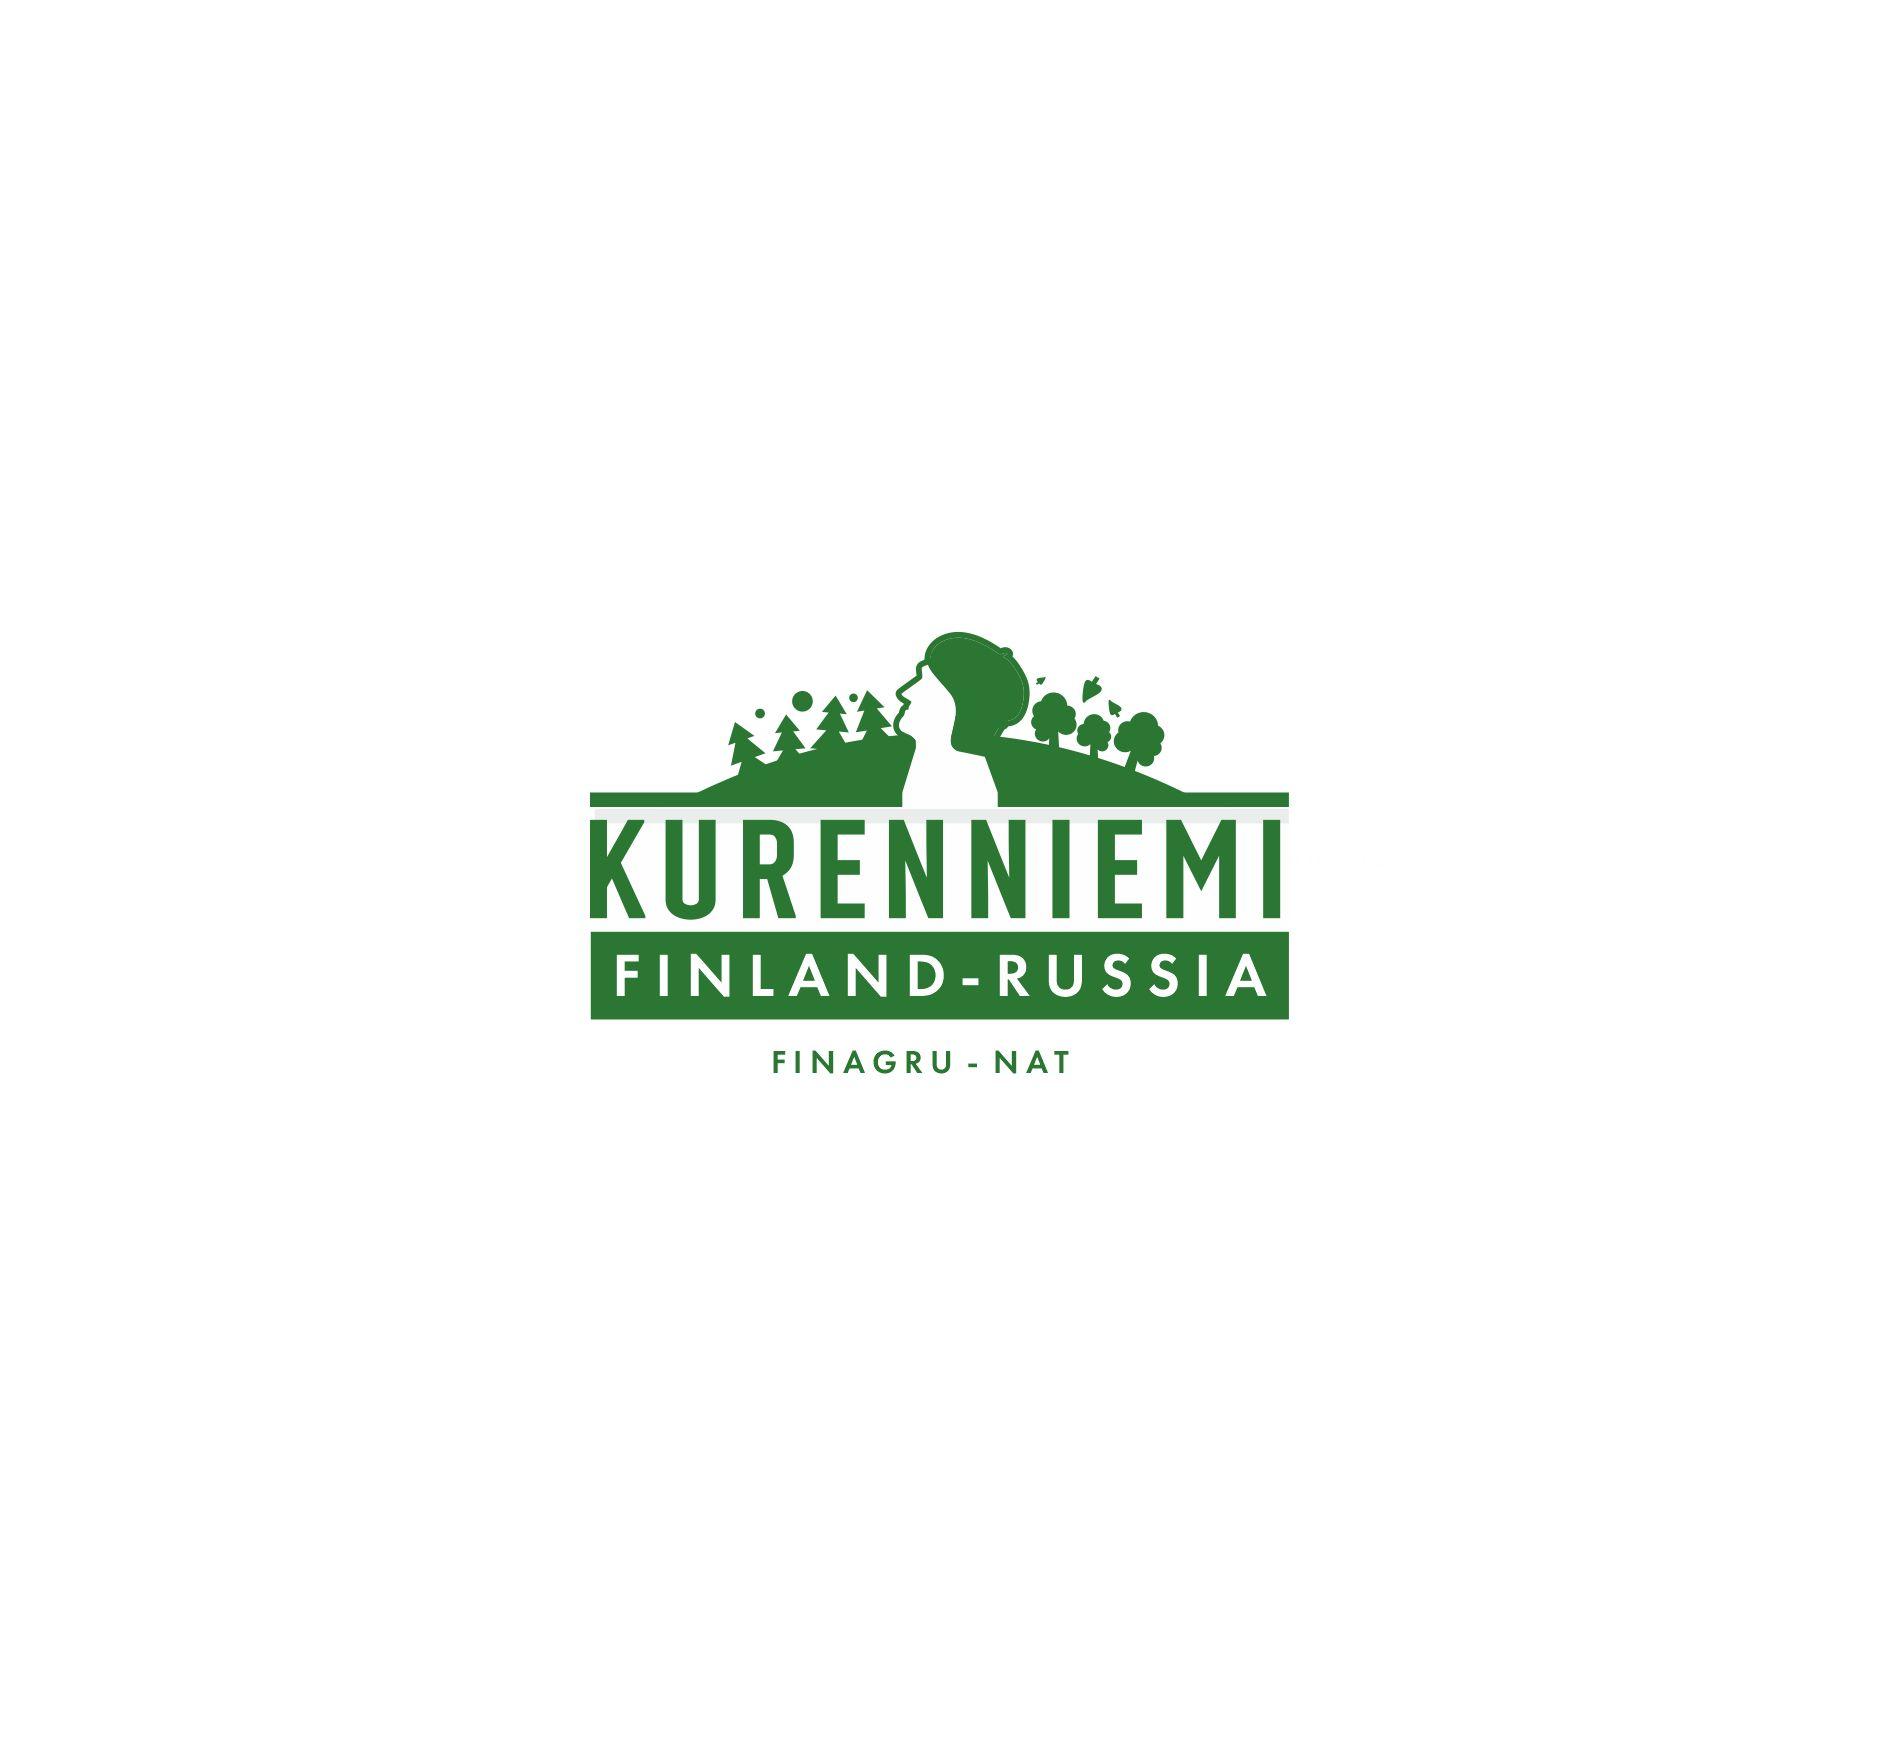 Логотип для Kurenniemi, FinAgRu-nat, Finland-Russia - дизайнер evelina_yaxina